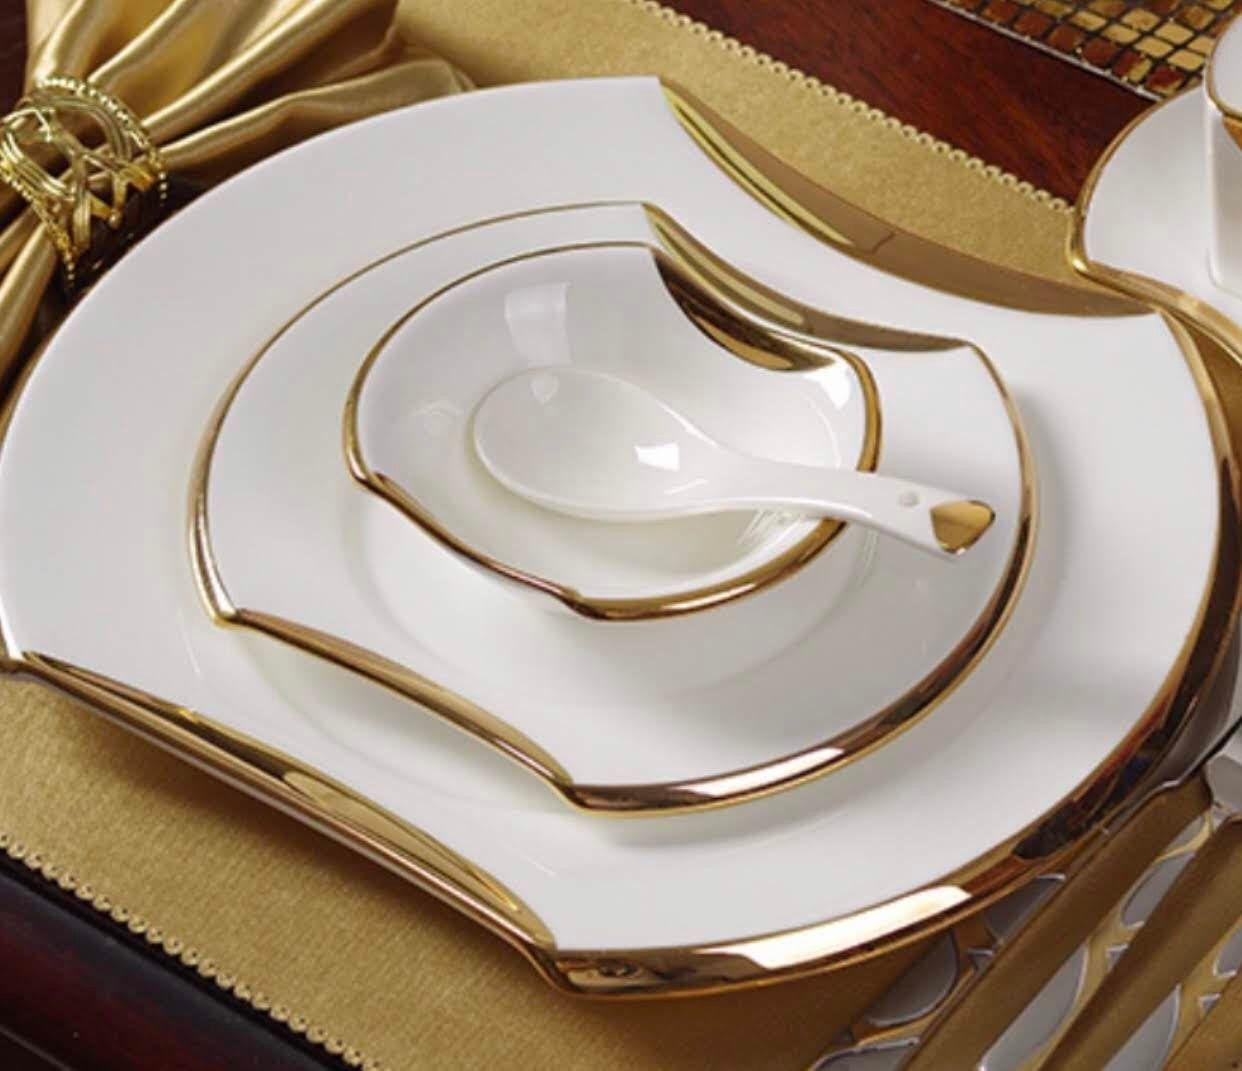 Dinner Plate Set Luxury Oval Shape Gold Banded White Fine Bone